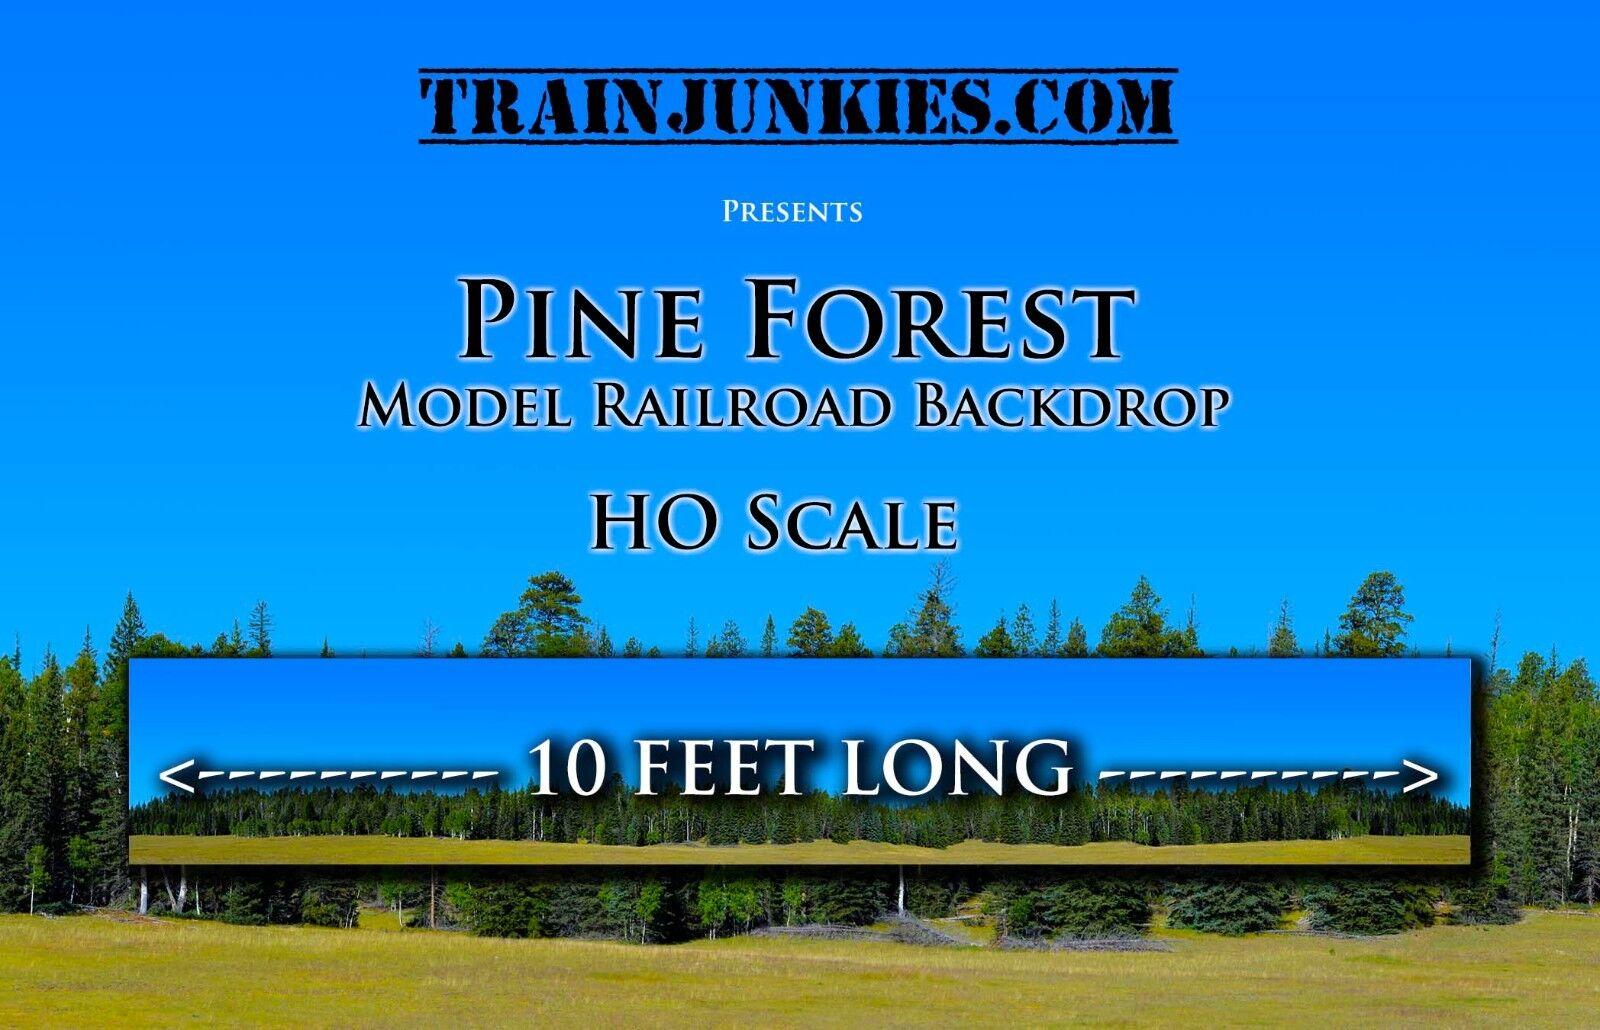 minoristas en línea Trainjunkies Pinar Escala Ho Maqueta De Tren telón de fondo fondo fondo 120 x18   preferente